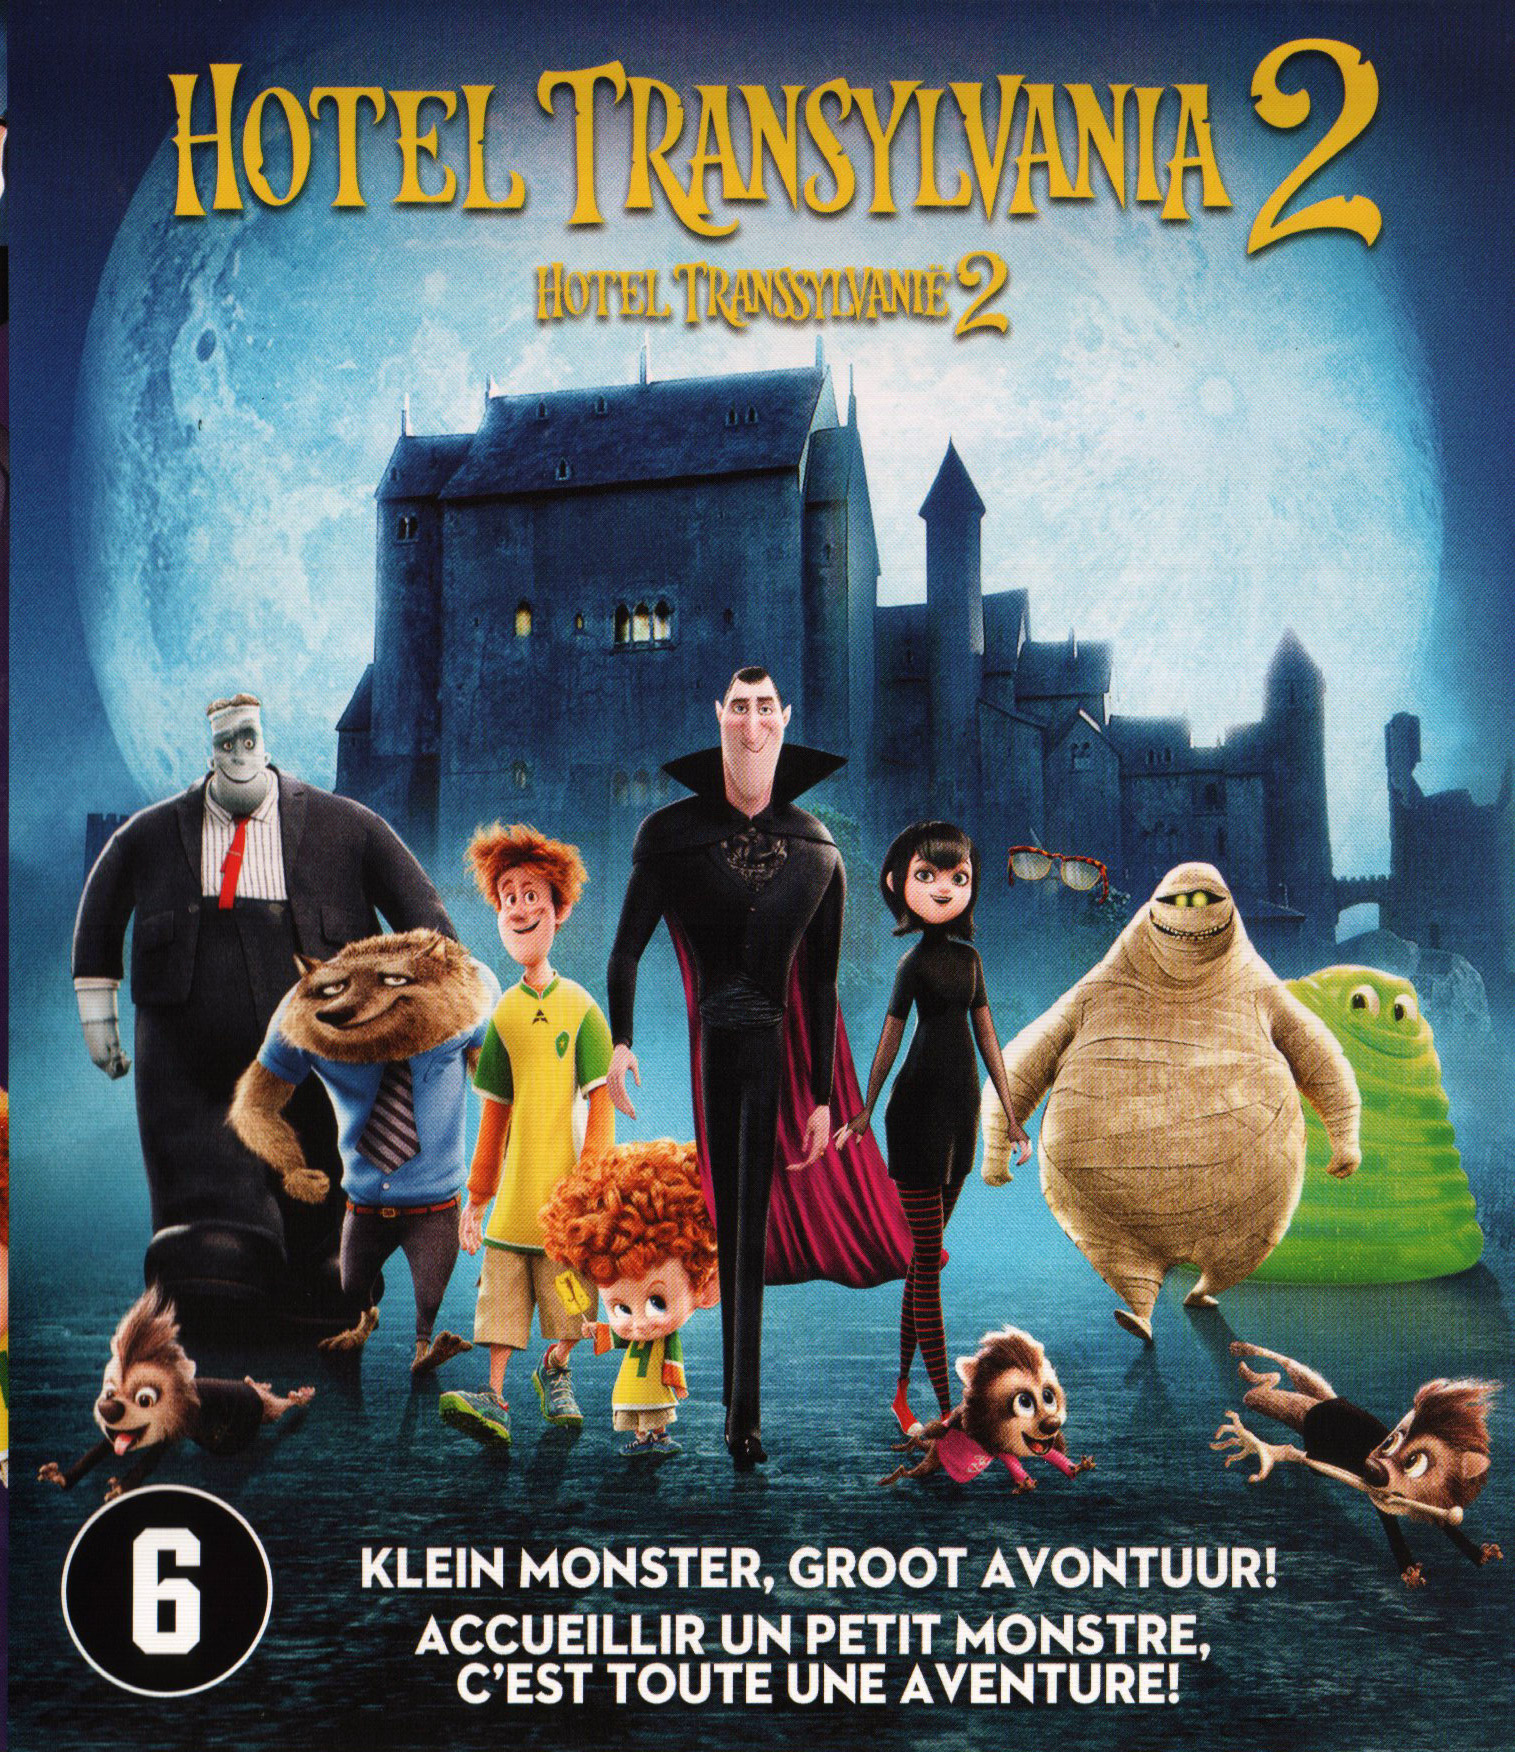 Hotel Transylvania Nederlands Gesproken Download Adobe Photoshop